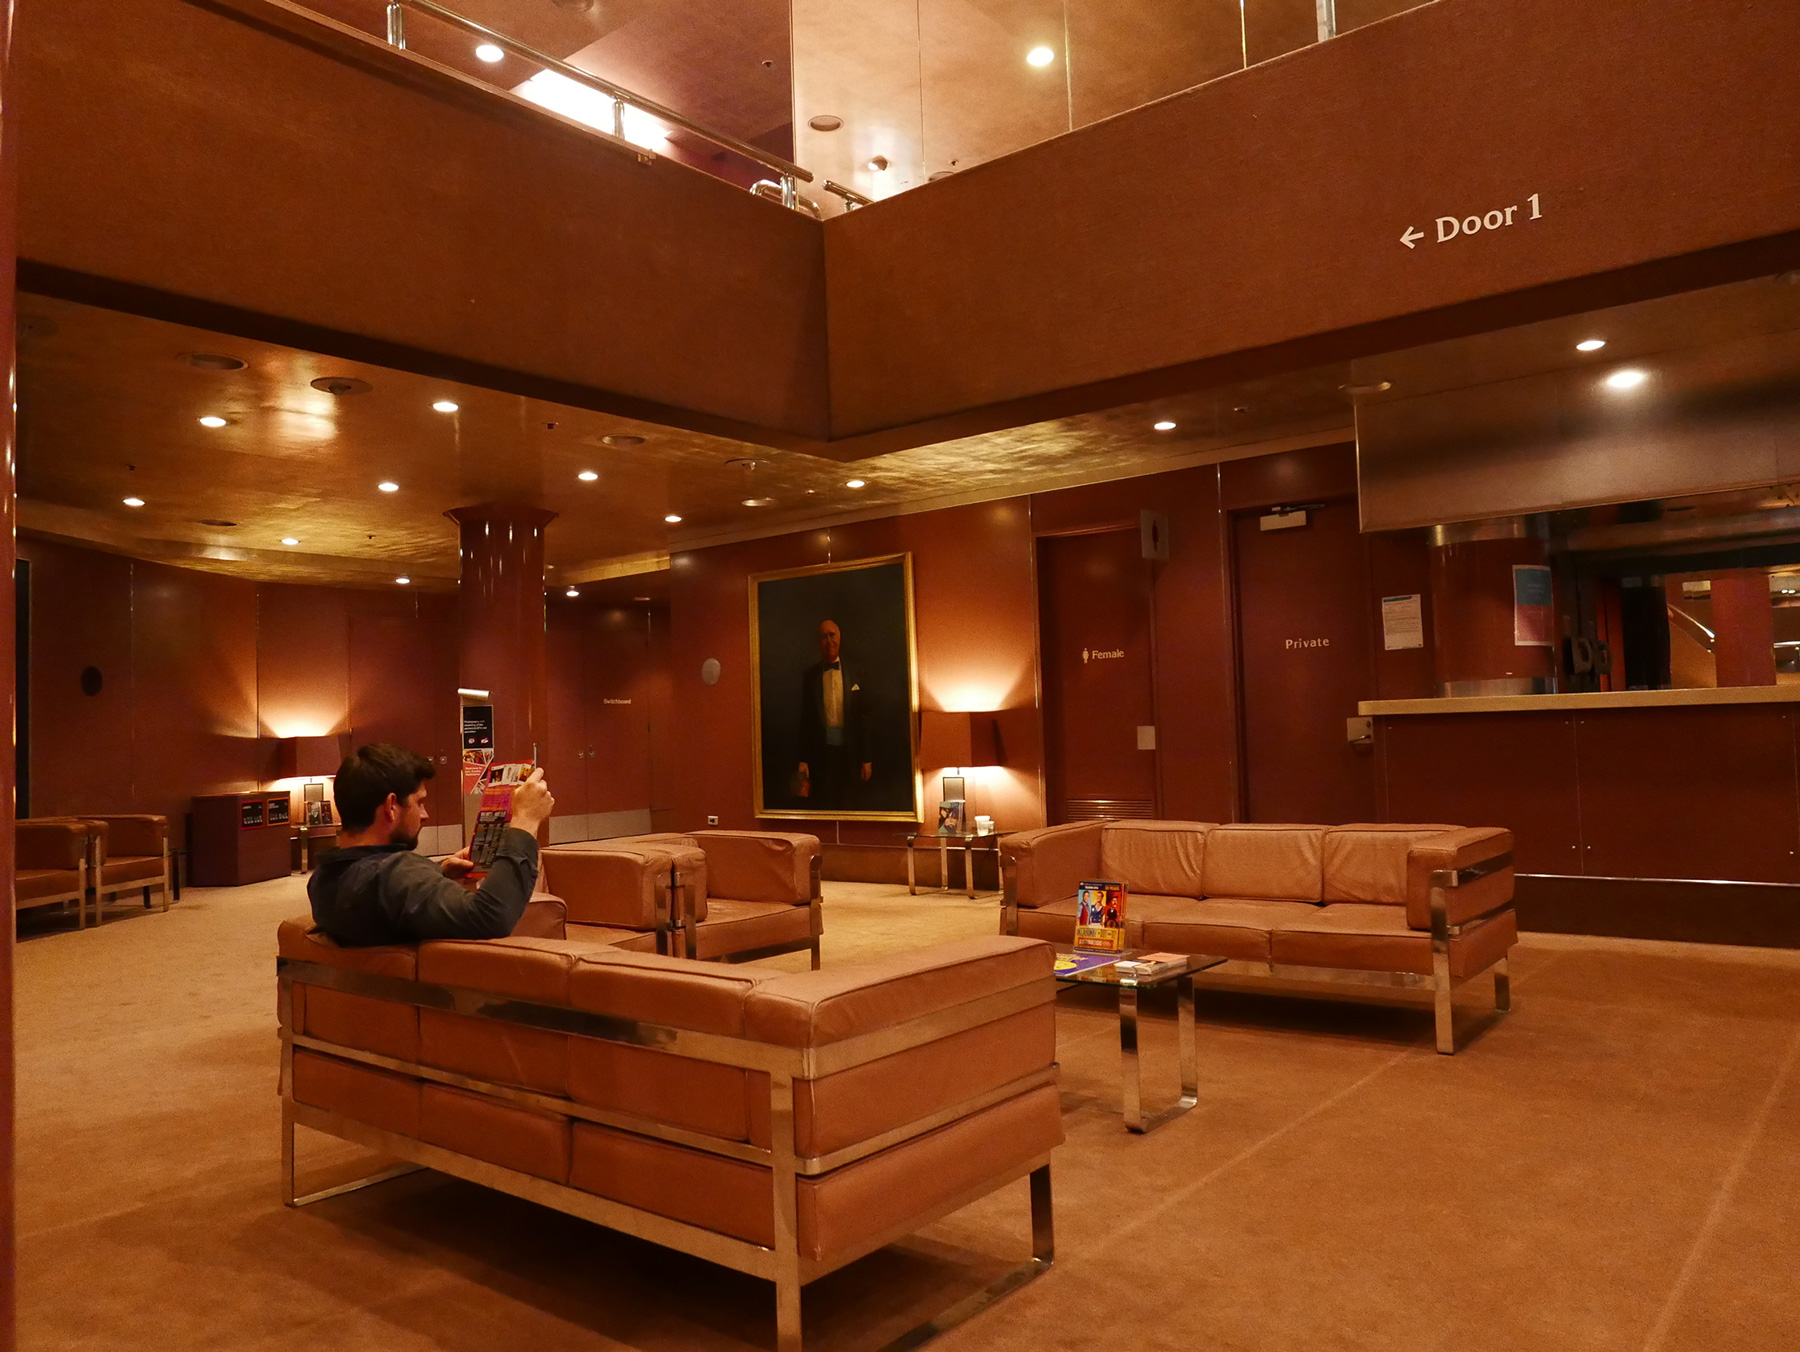 Fairfax Studio foyer and bar